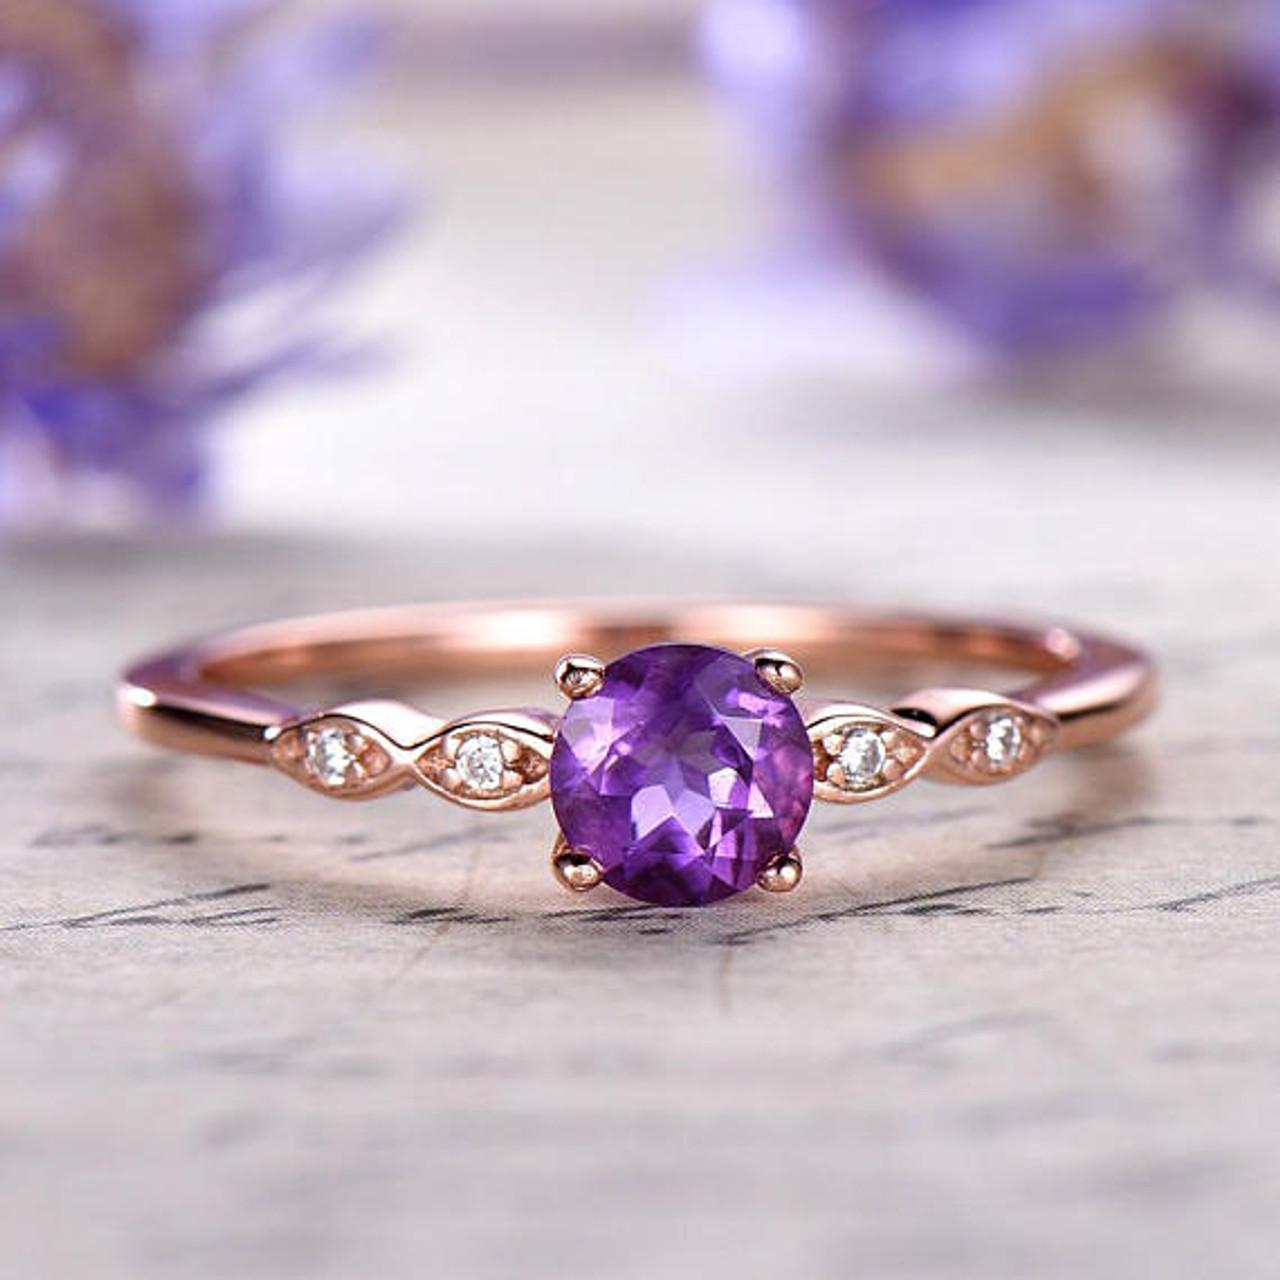 Amethyst engagement ring antique Diamond February birthstone 14k 18k